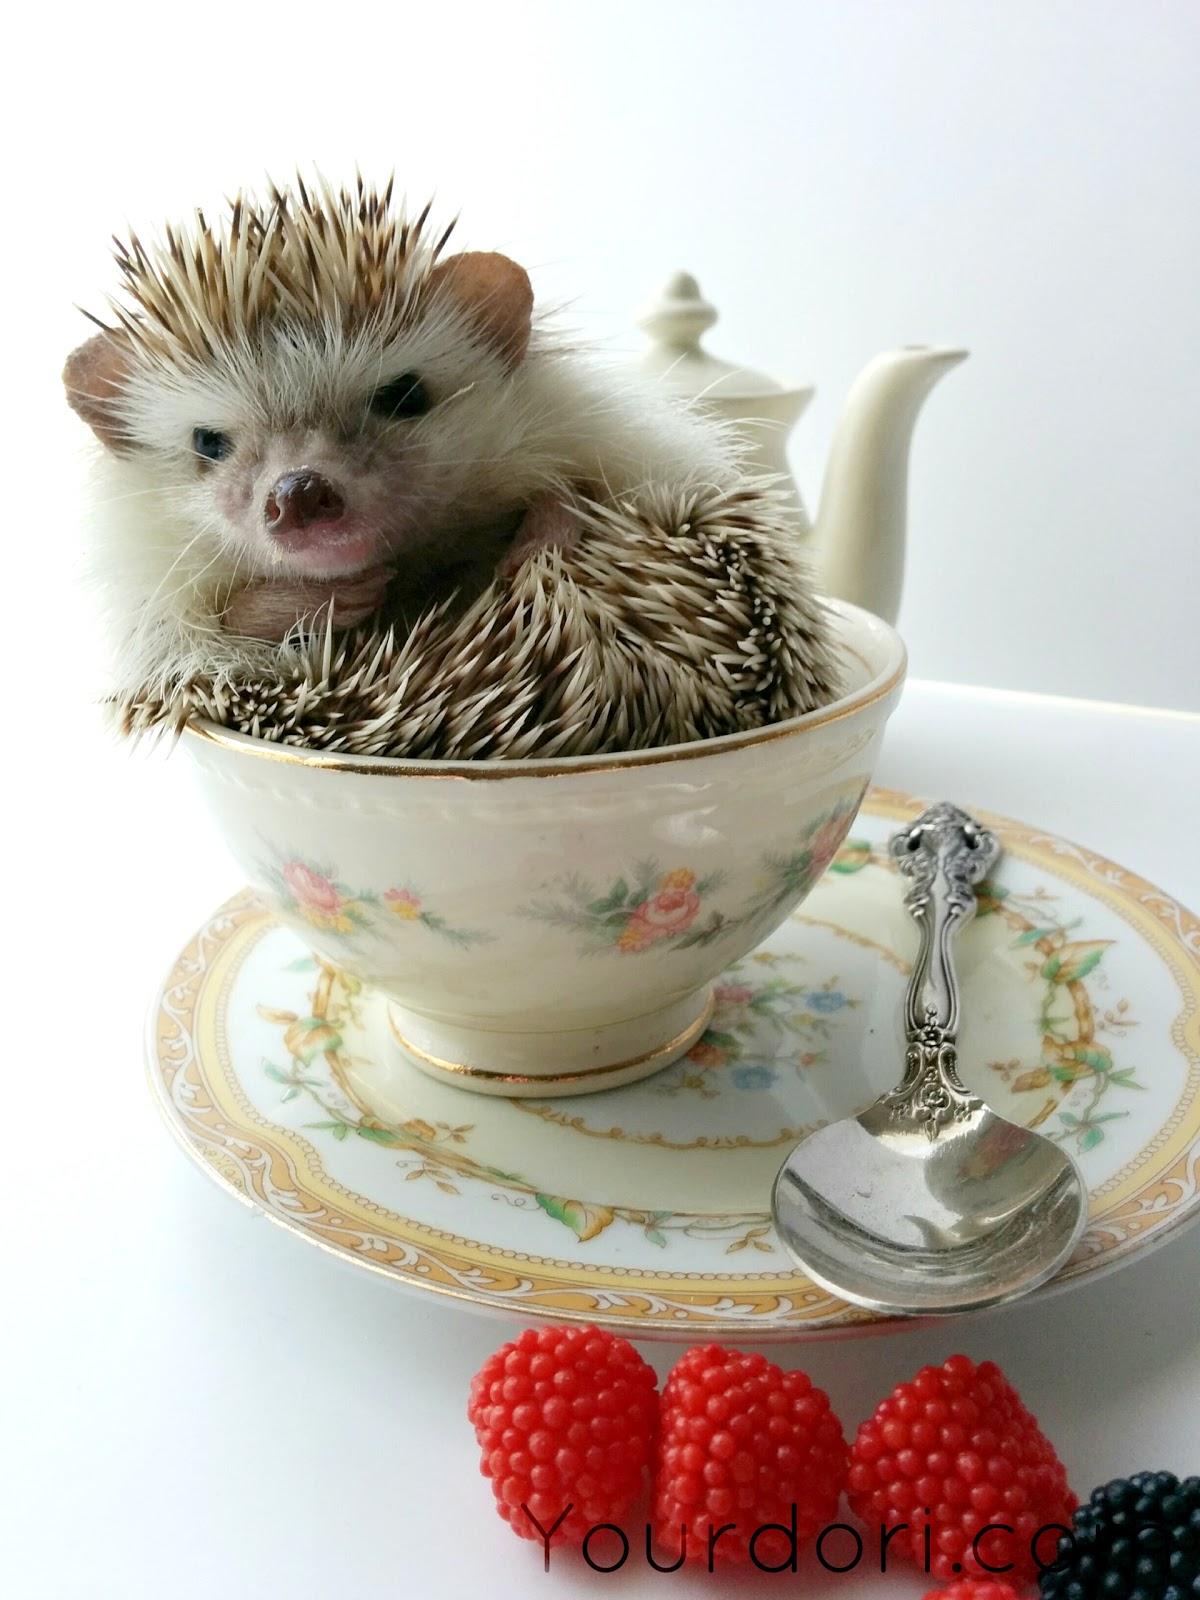 Cute Hedgehog, Planners, Lists, List Making, Gold Bulldog Clips, Midori, Travelers Notebook